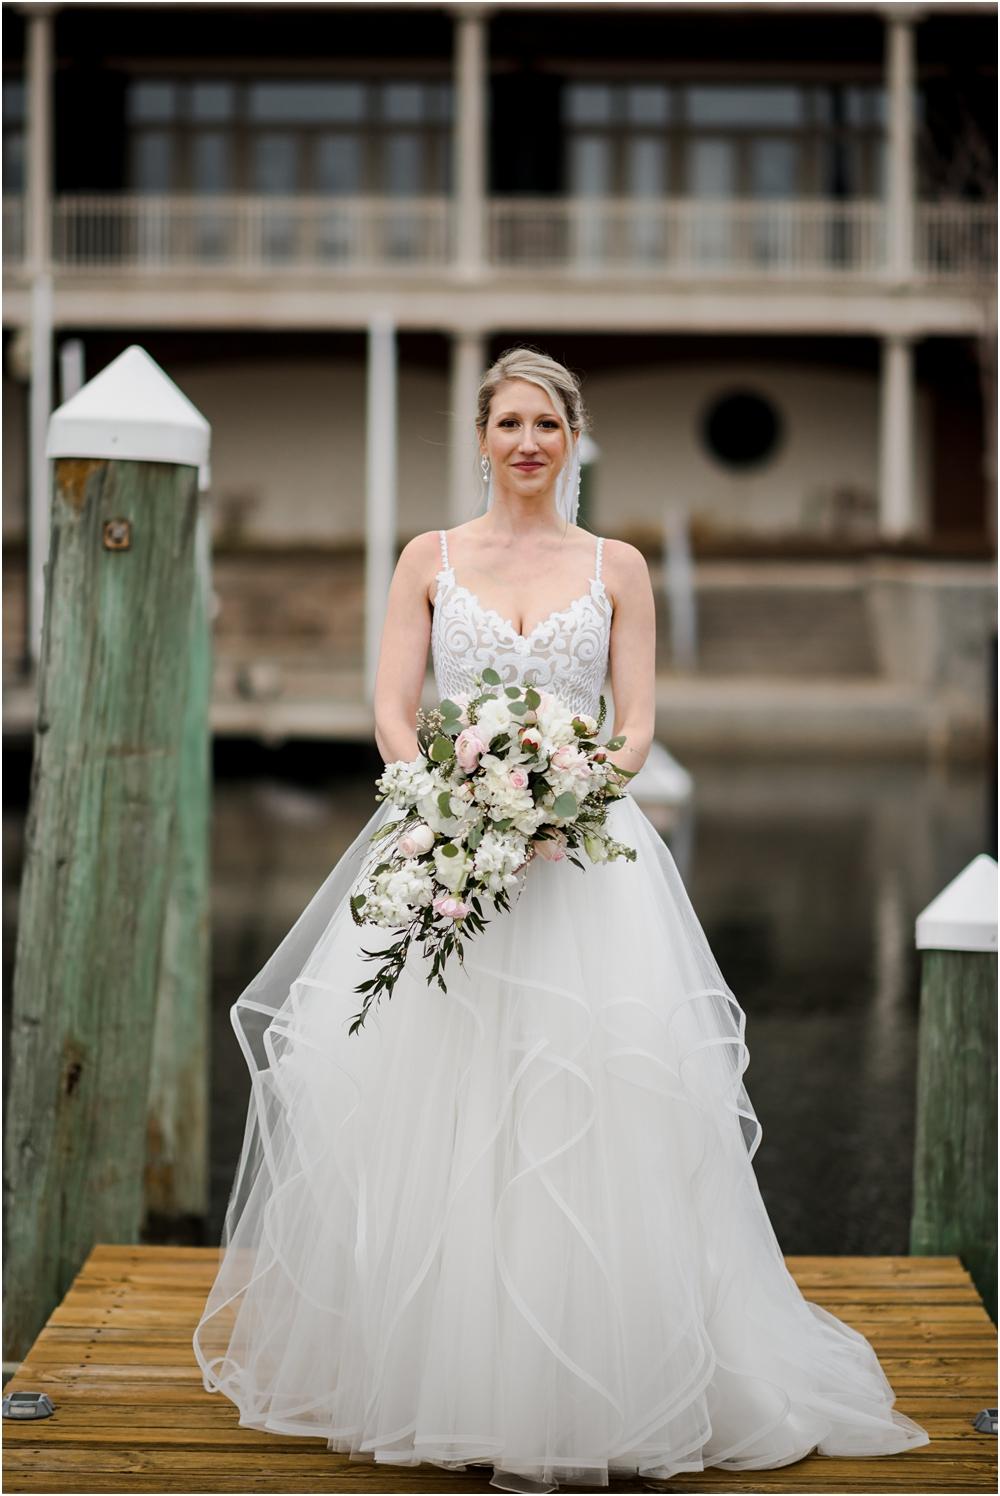 oconnor-pensacola-florida-wedding-photographer-kiersten-taylor-75.jpg